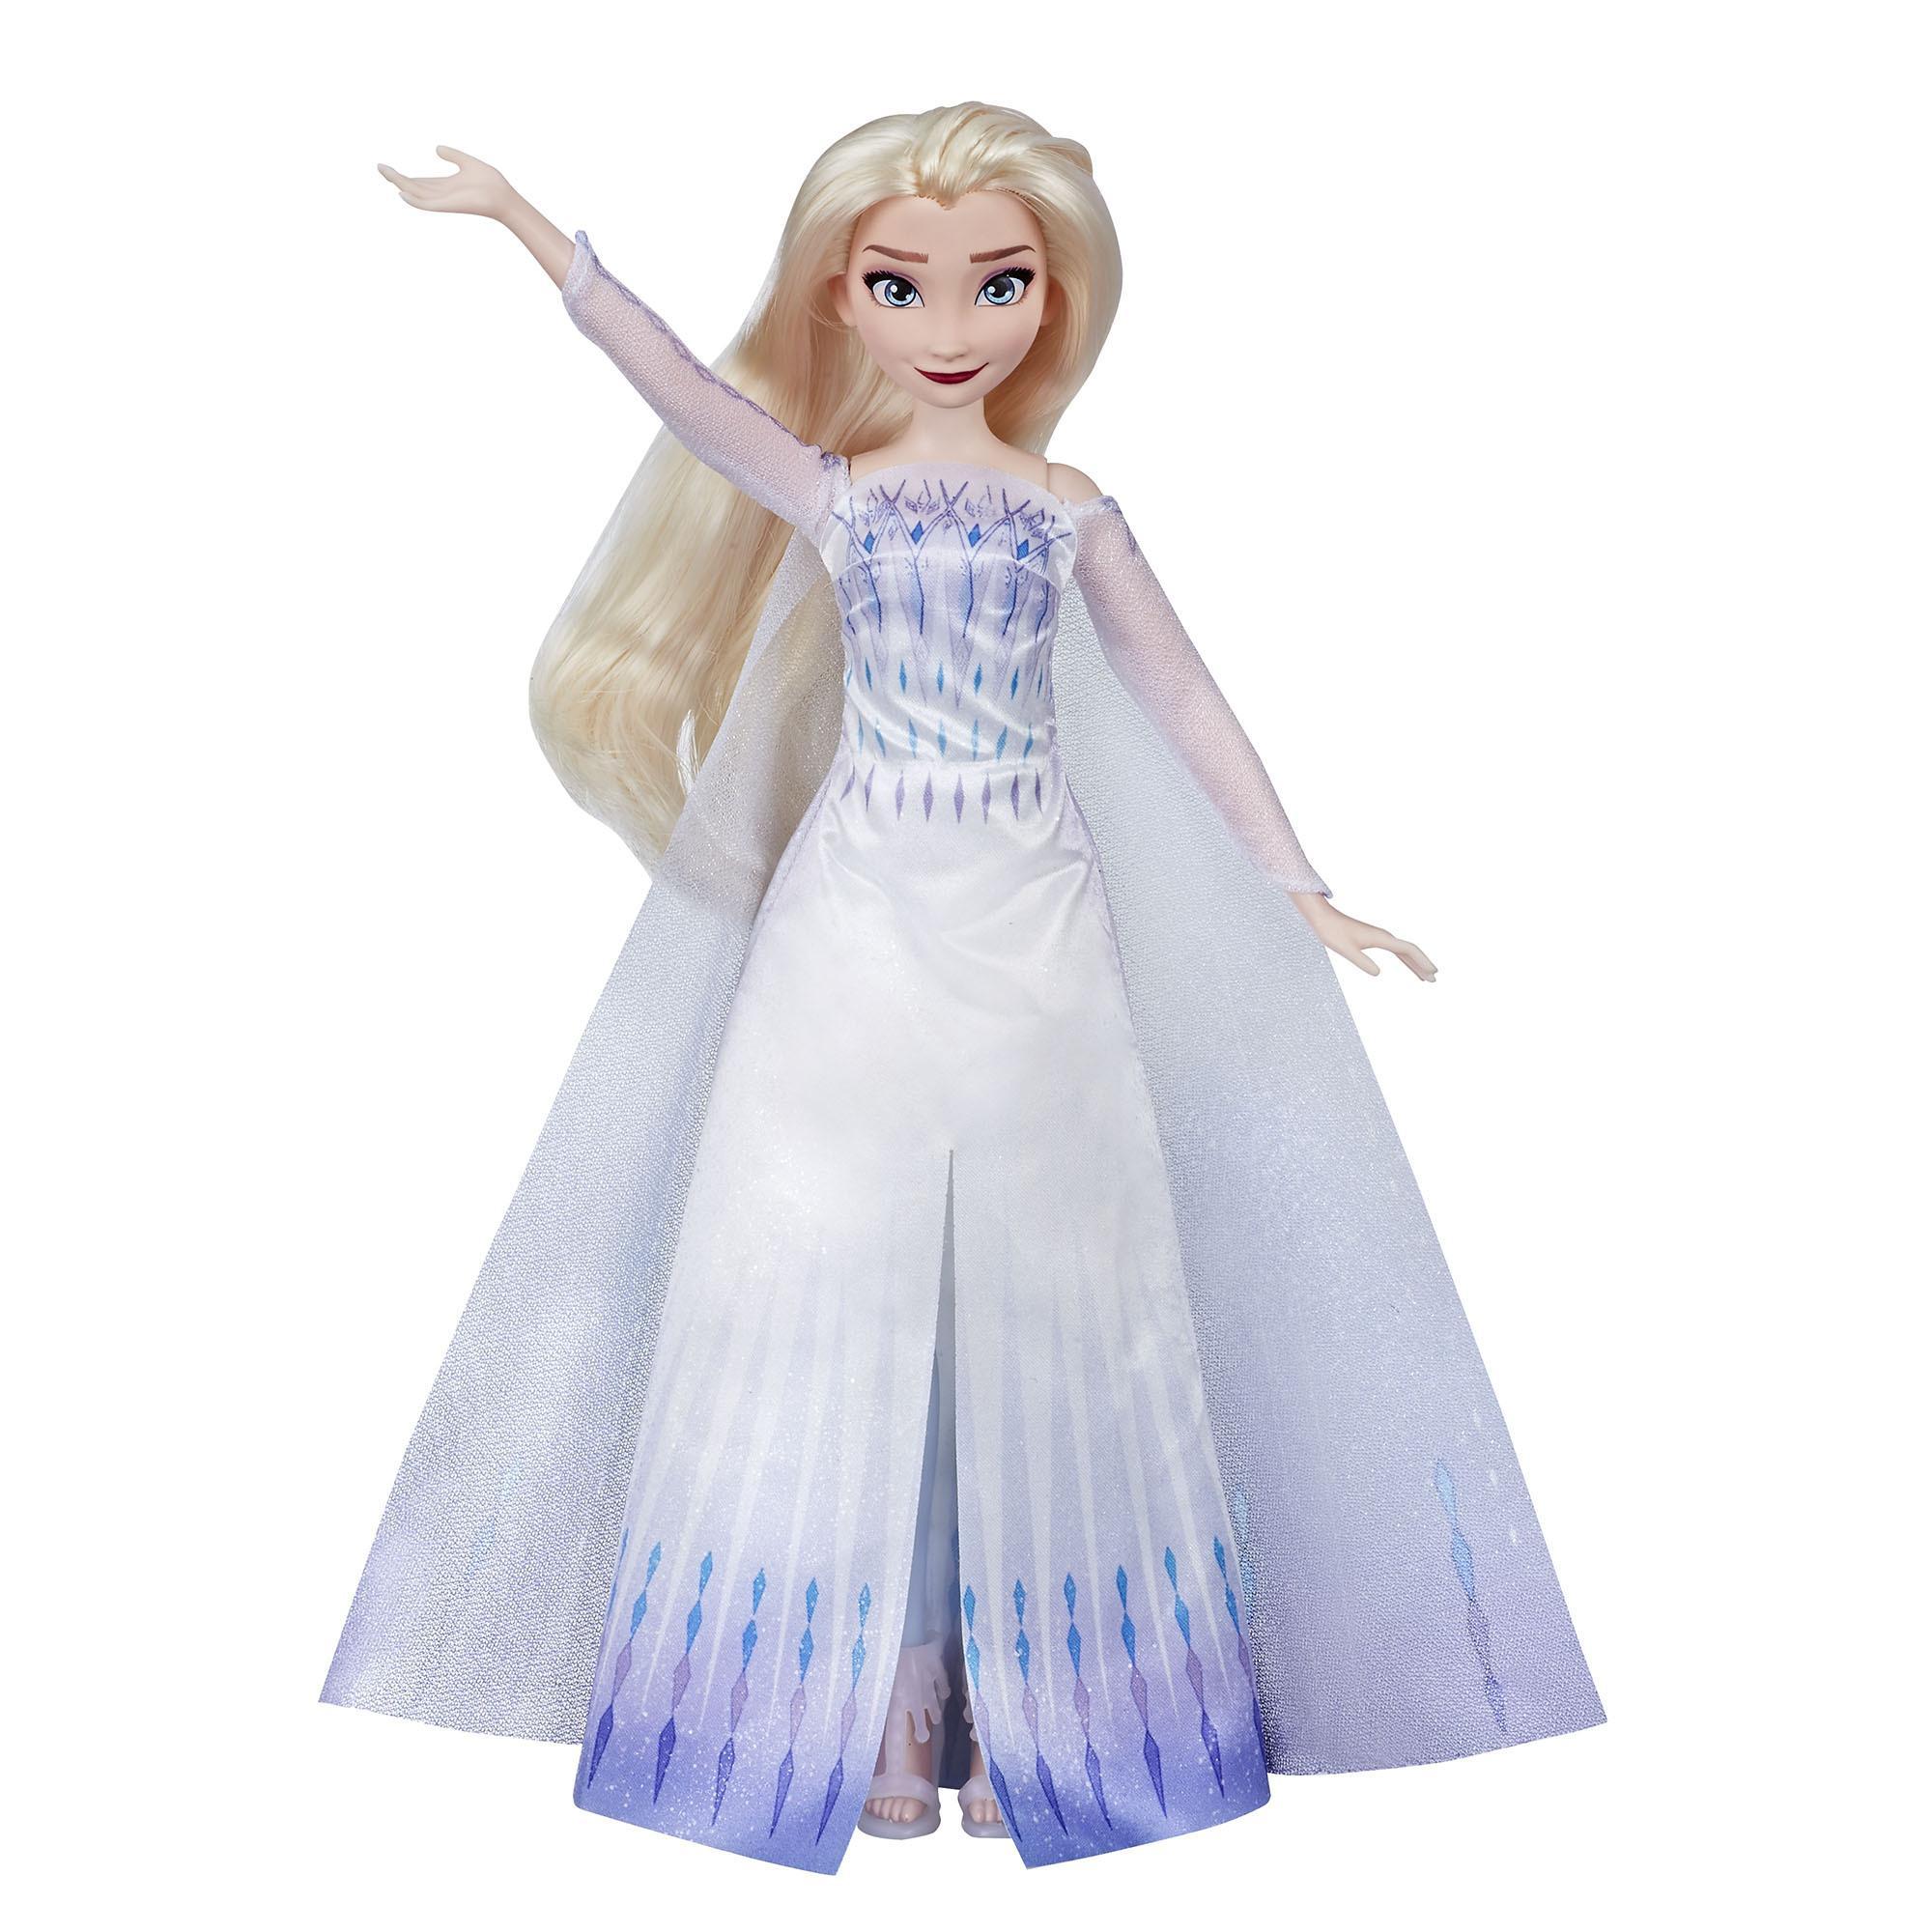 "Laulava Disney Frozen Musical Adventure Elsa -nukke, laulaa Frozen 2 -elokuvan ""Show Yourself"" -kappaleen"